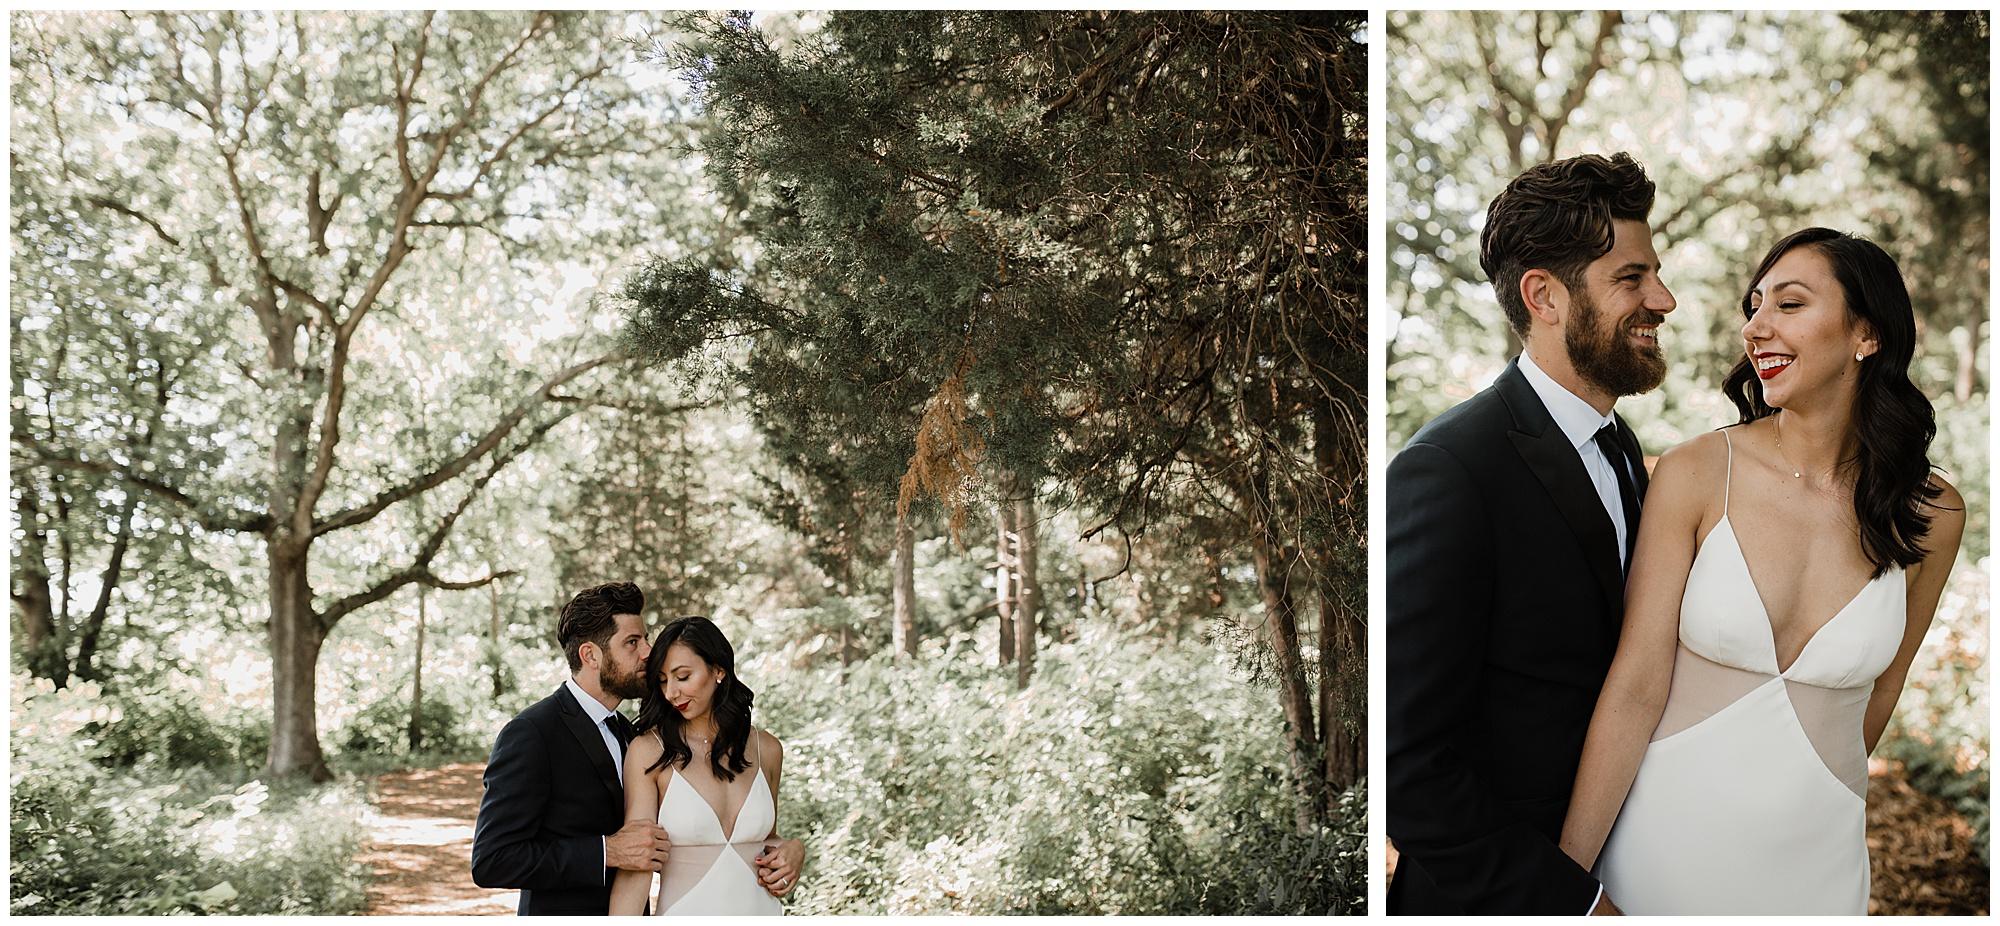 allerton_park_wedding_champaign_il_chicago_wright_photographs_ne_0012.jpg